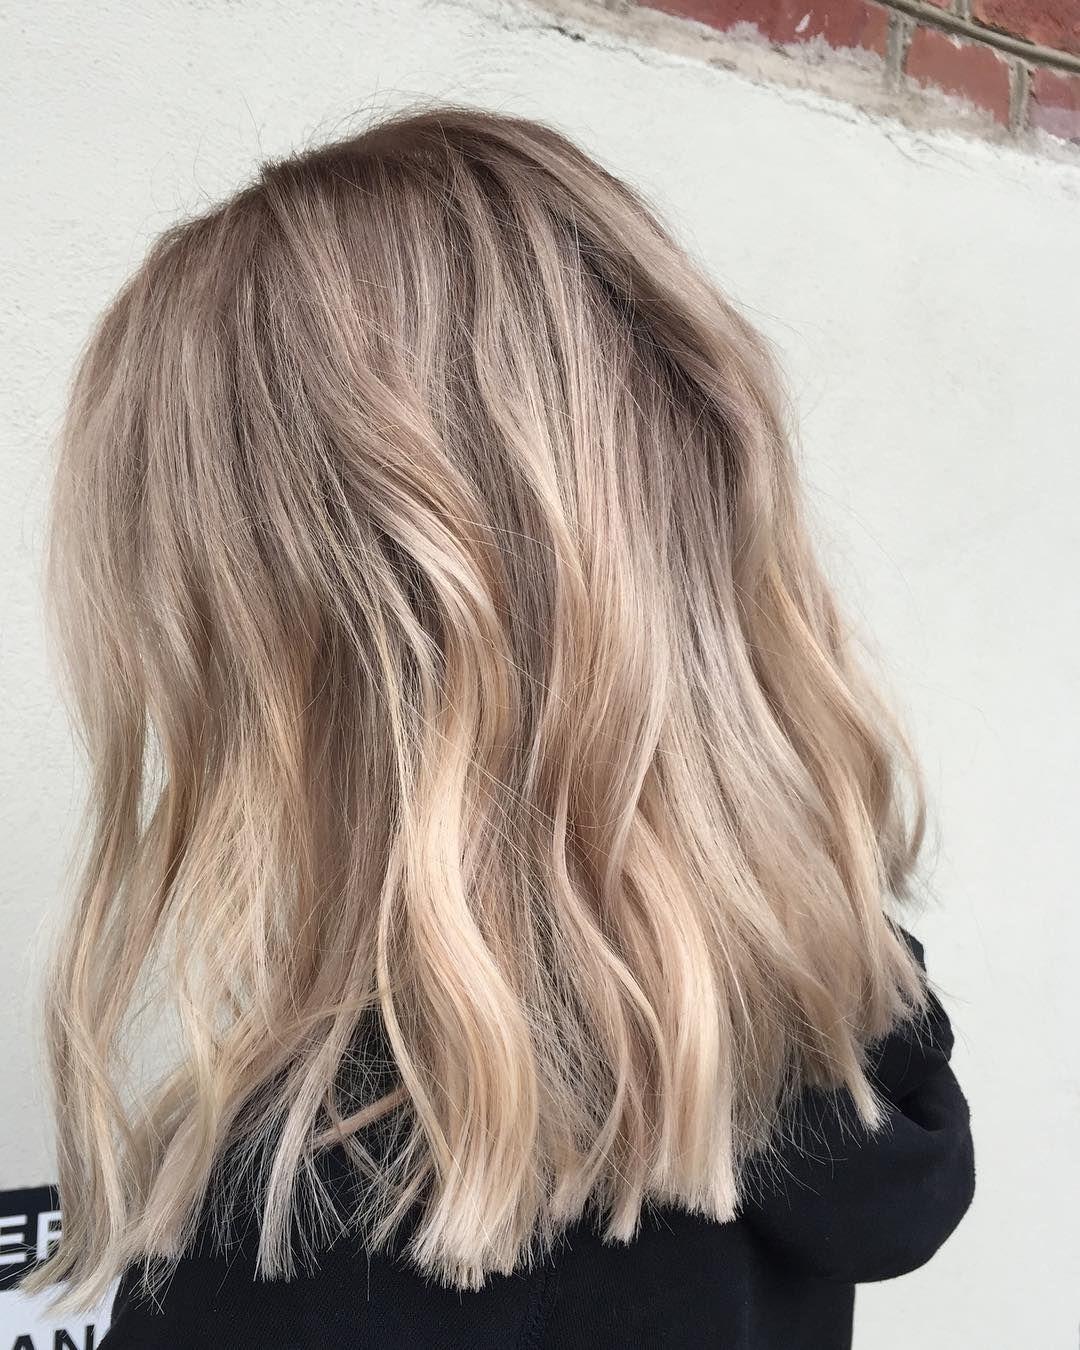 10 Lob Haircut Ideas – Edgy Cuts & Hot New Colors – PoPular Haircuts